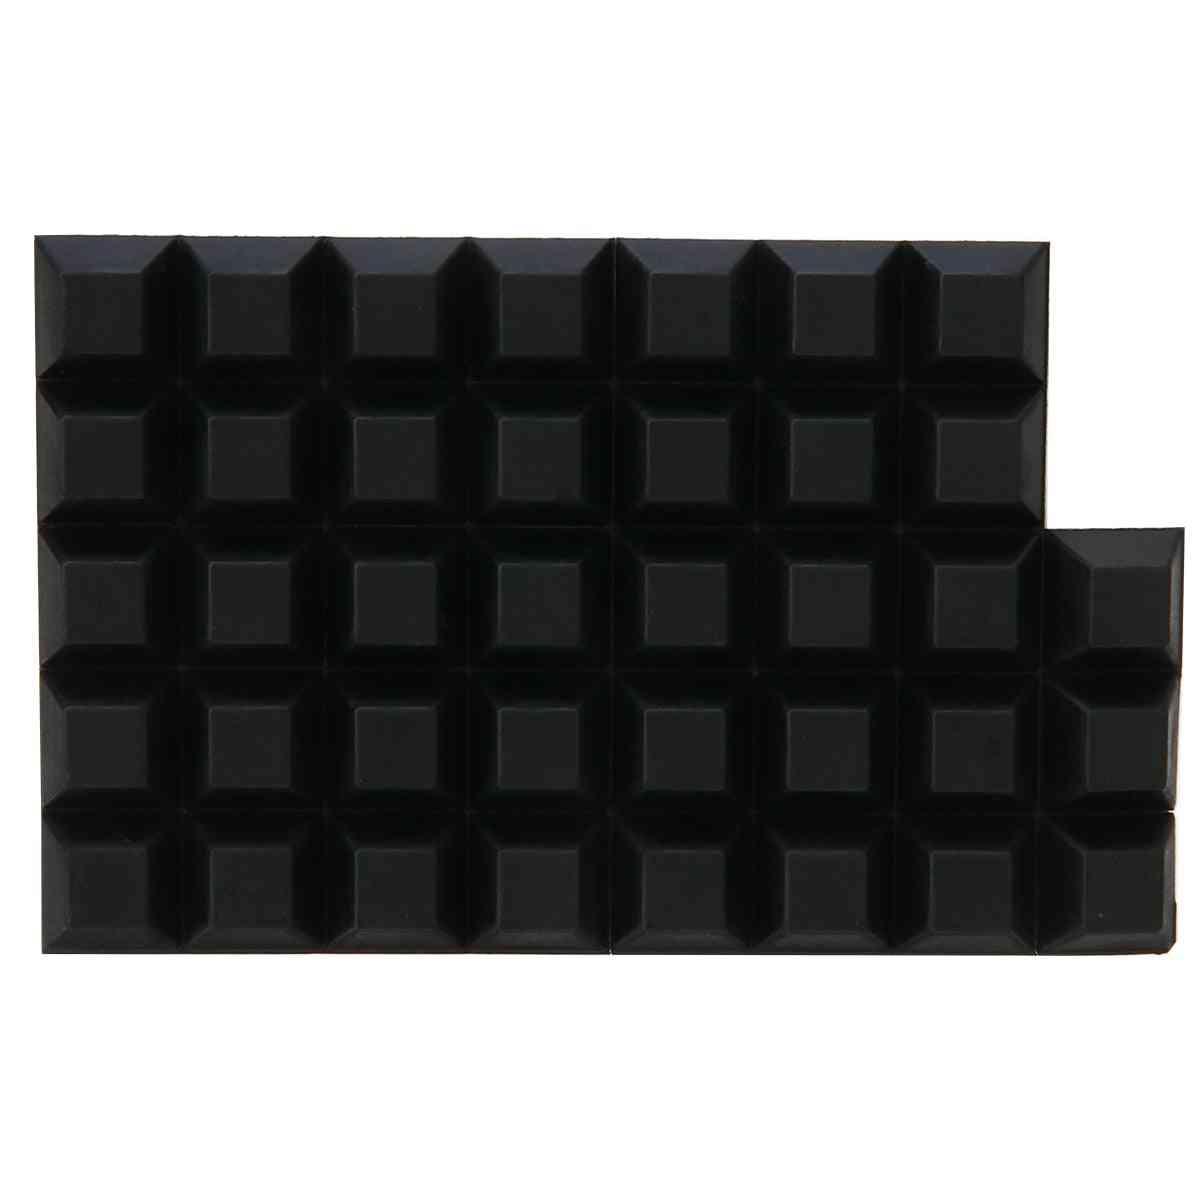 Self Adhesive Rubber Bumper, Stop Non-slip Feet Door Buffer Pads